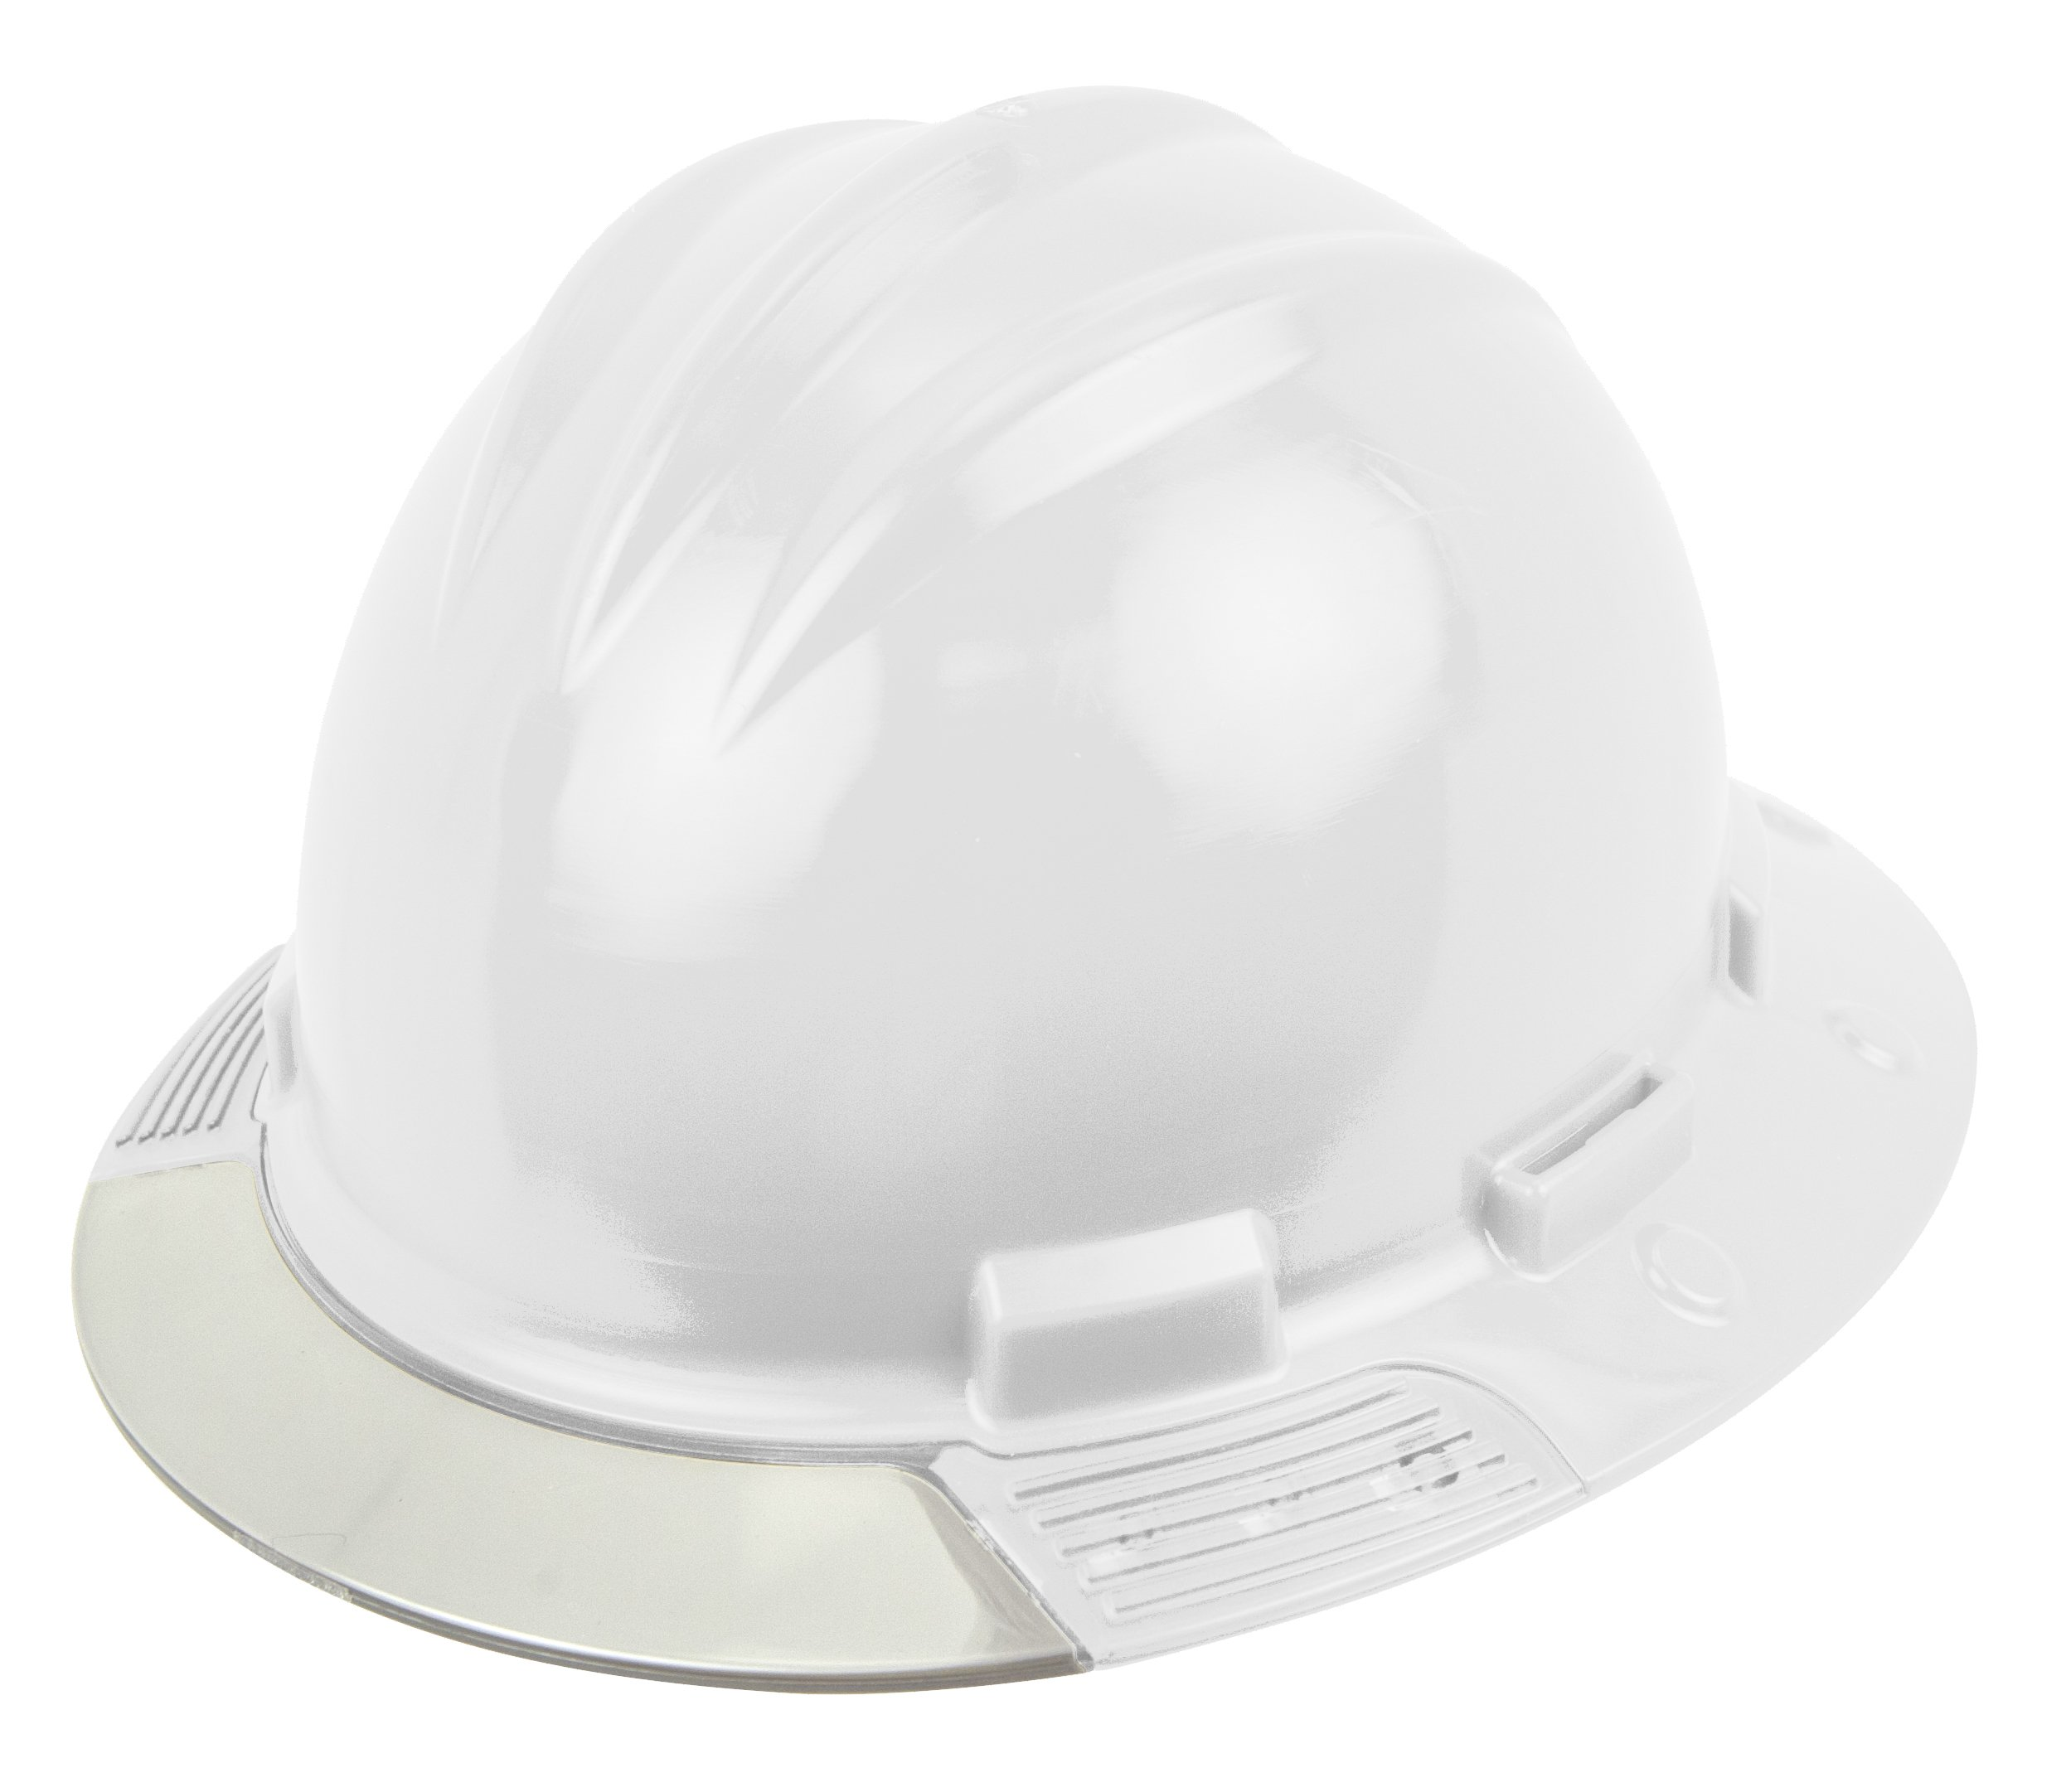 Bullard AVWHBC Above View Hard Hat, White, Vinyl Brow Pad, Ratchet Suspension, Clear Visor, One Size